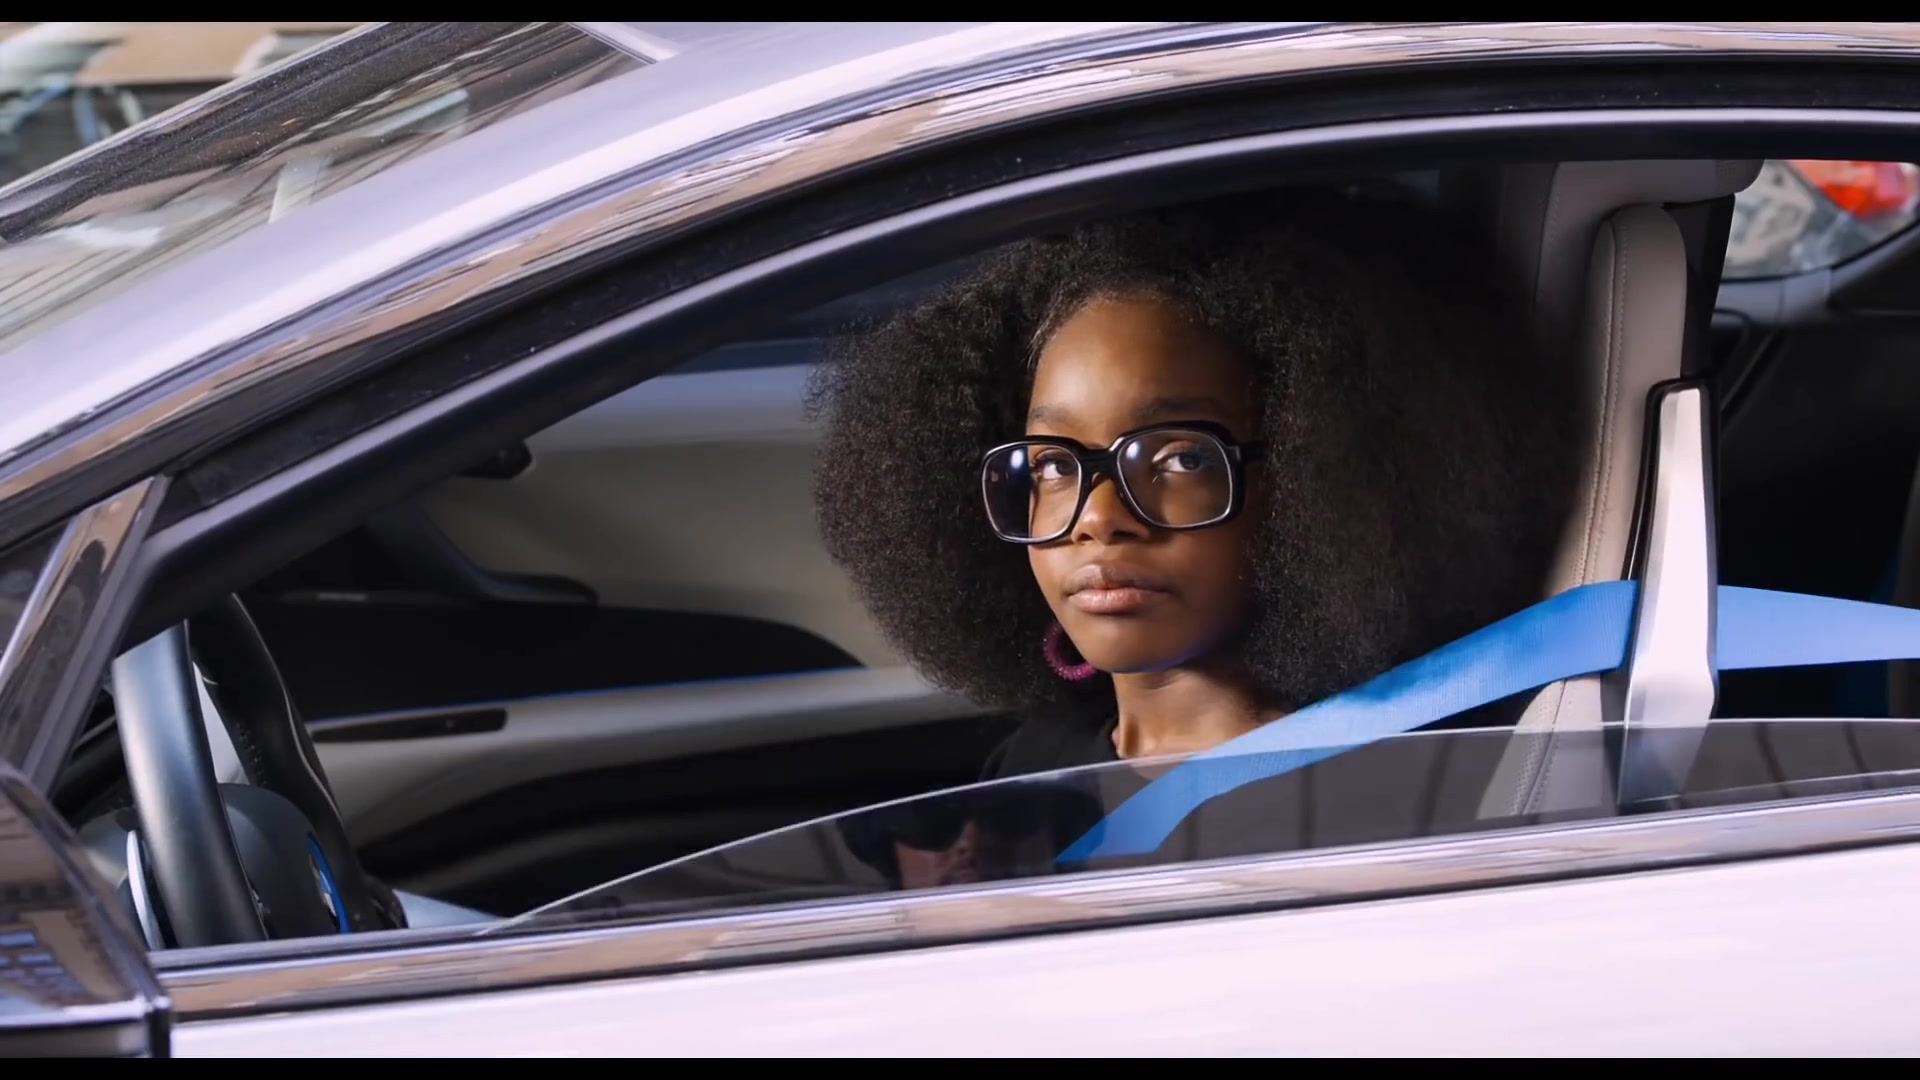 Bmw I8 Car In Little 2019 Movie